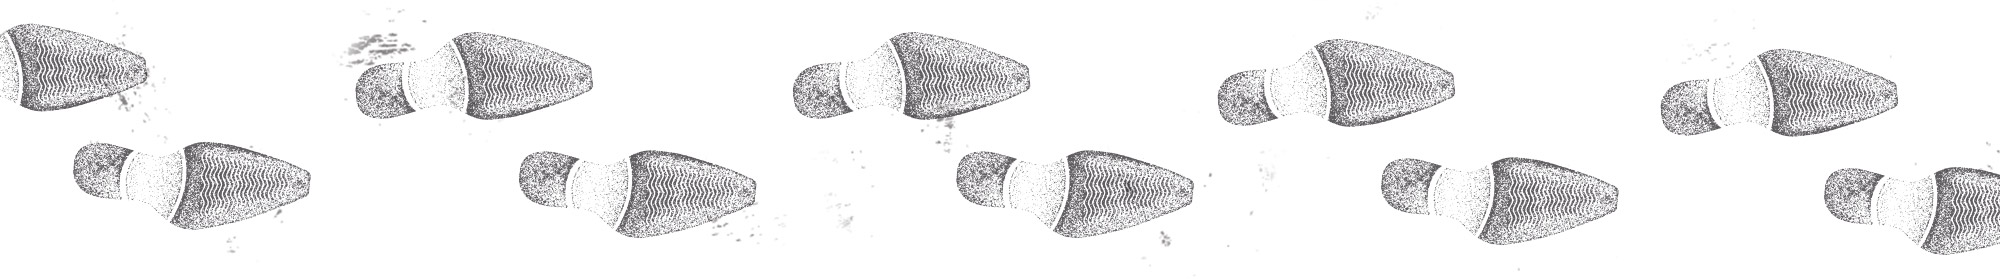 banner-footprints.jpg